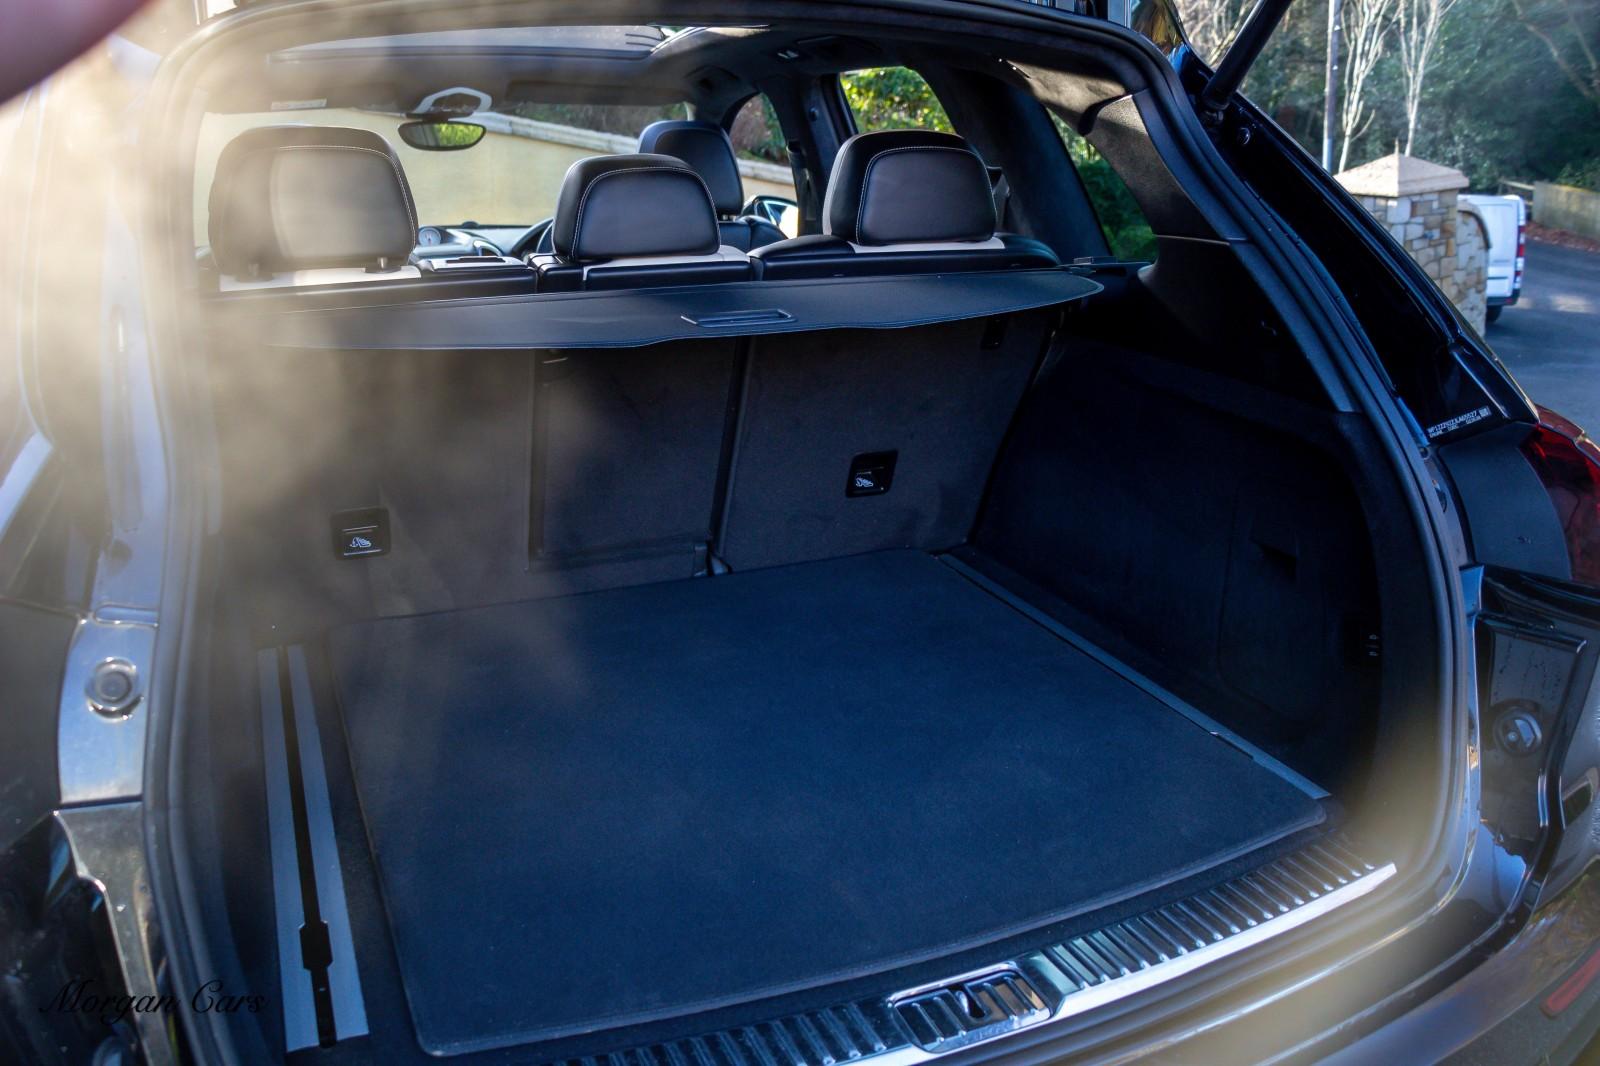 2017 Porsche Cayenne S D PLATINUM EDITION TIPTRONIC S Diesel Automatic – Morgan Cars 9 Mound Road, Warrenpoint, Newry BT34 3LW, UK full